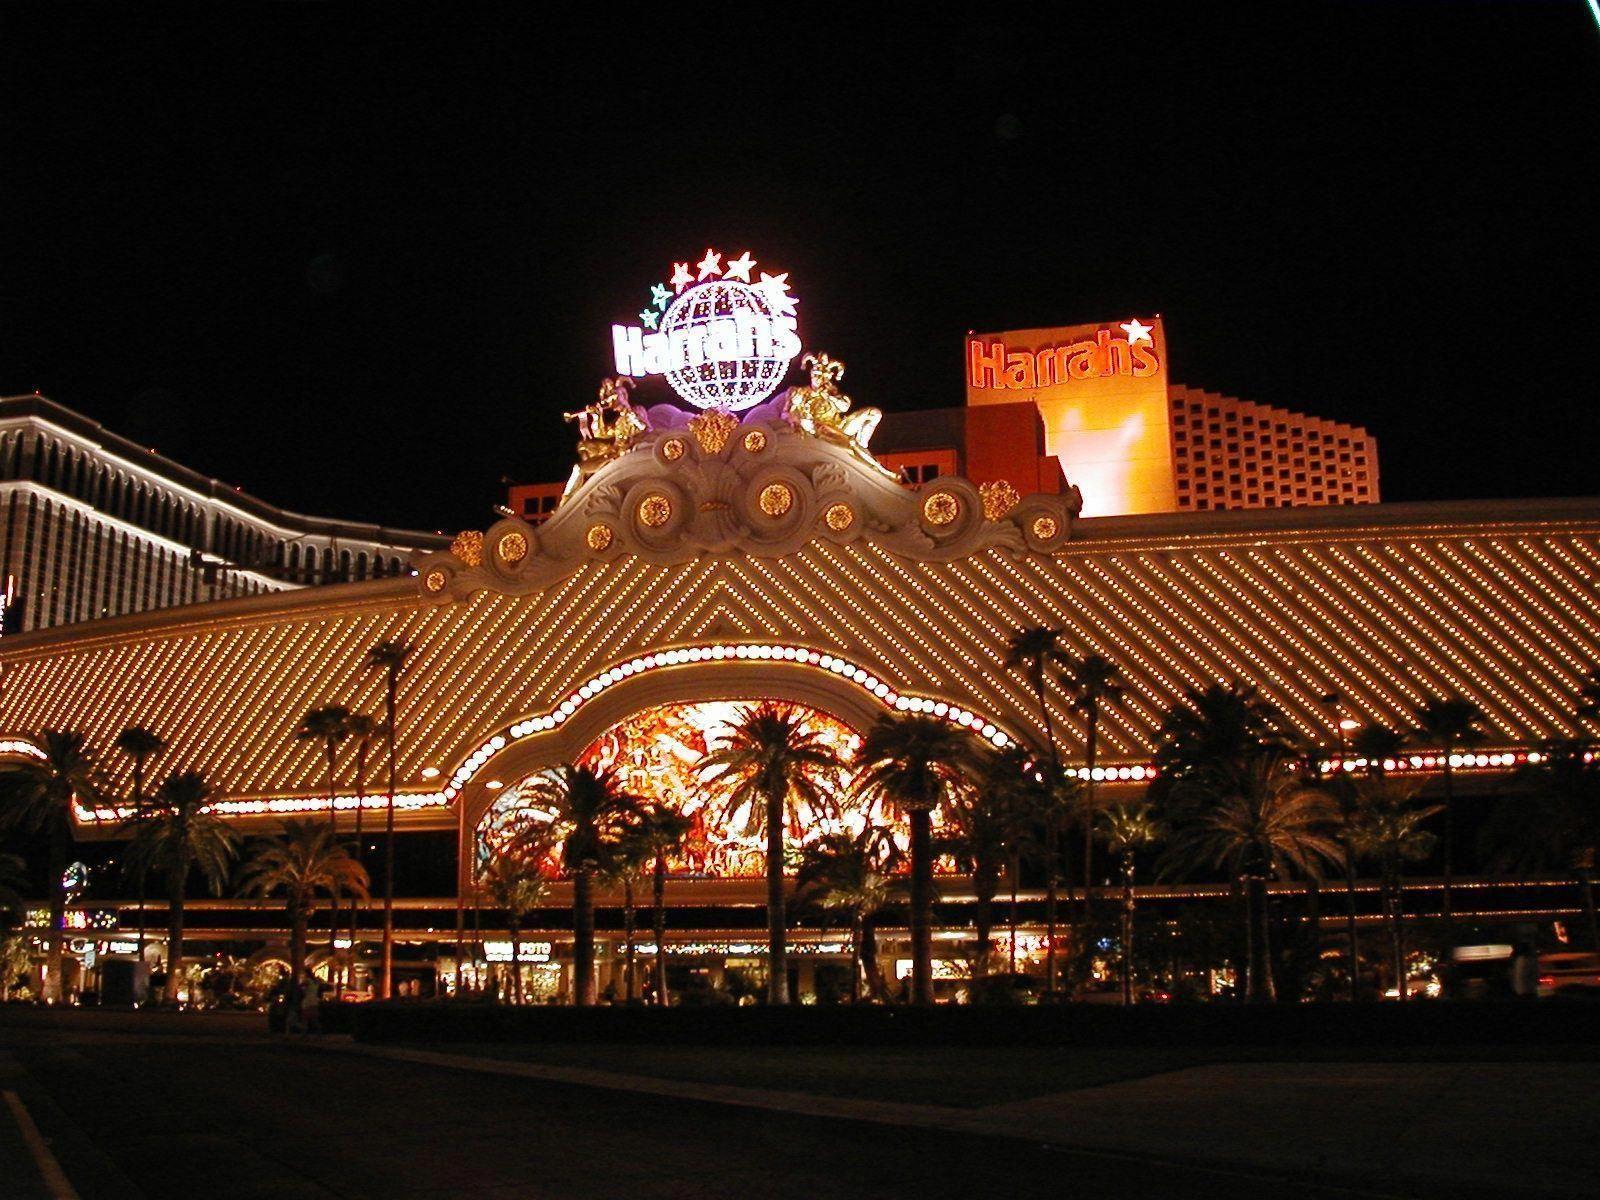 Furniture discount tampa key 4621812219 casino las